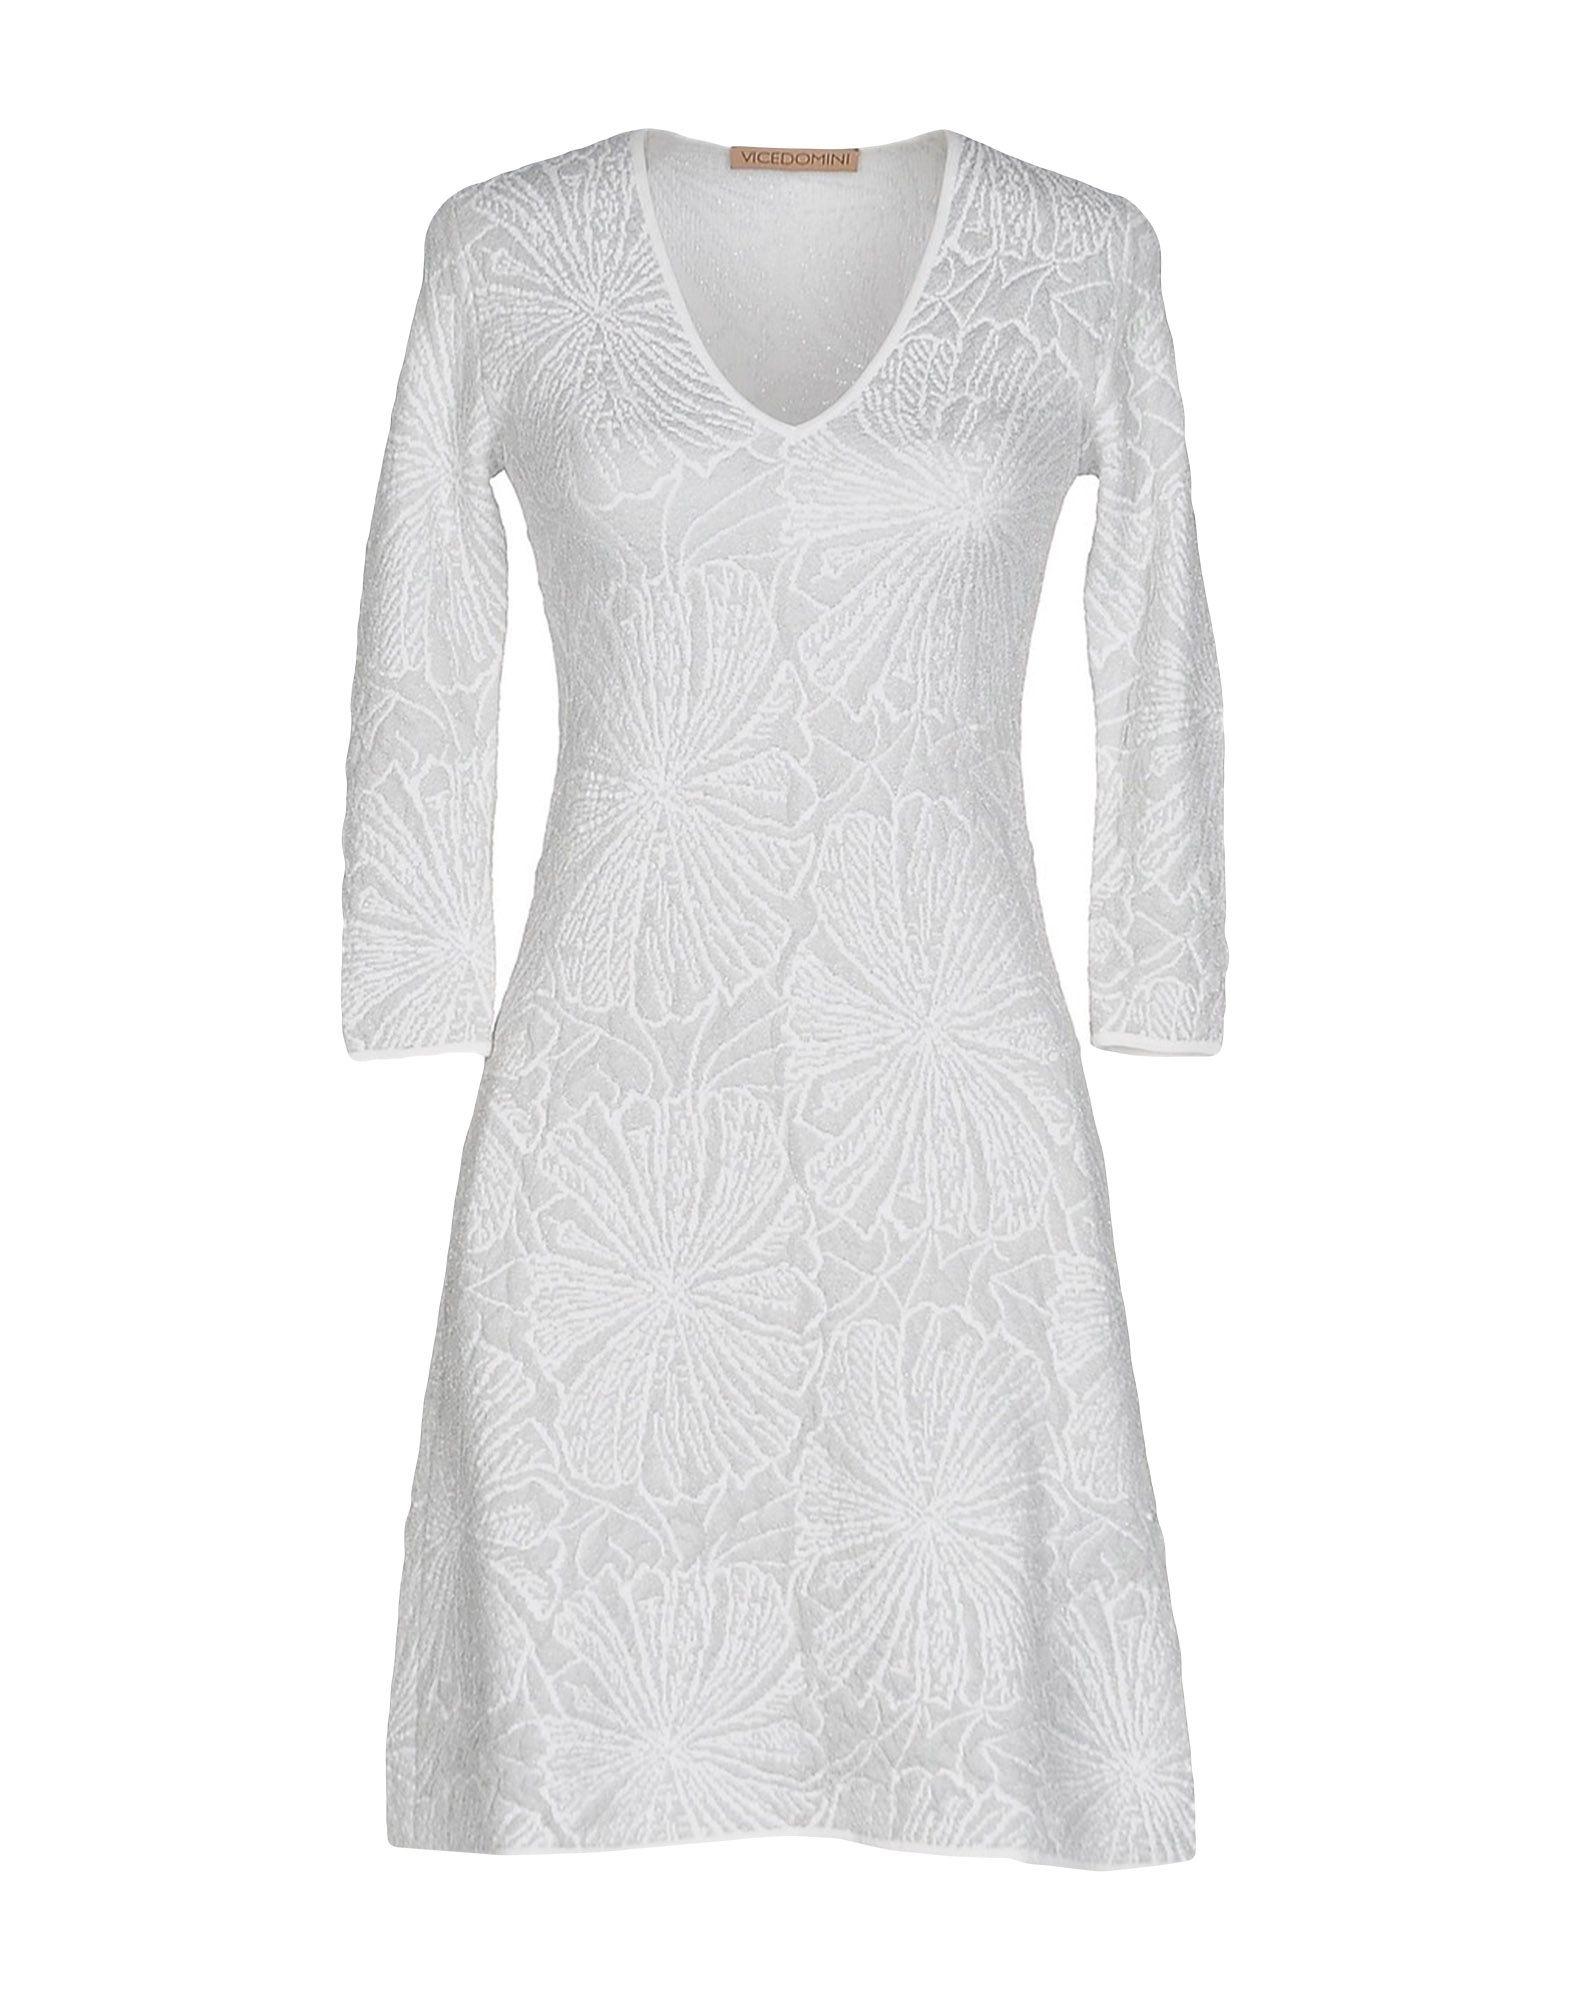 Vicedomini Short Dresses